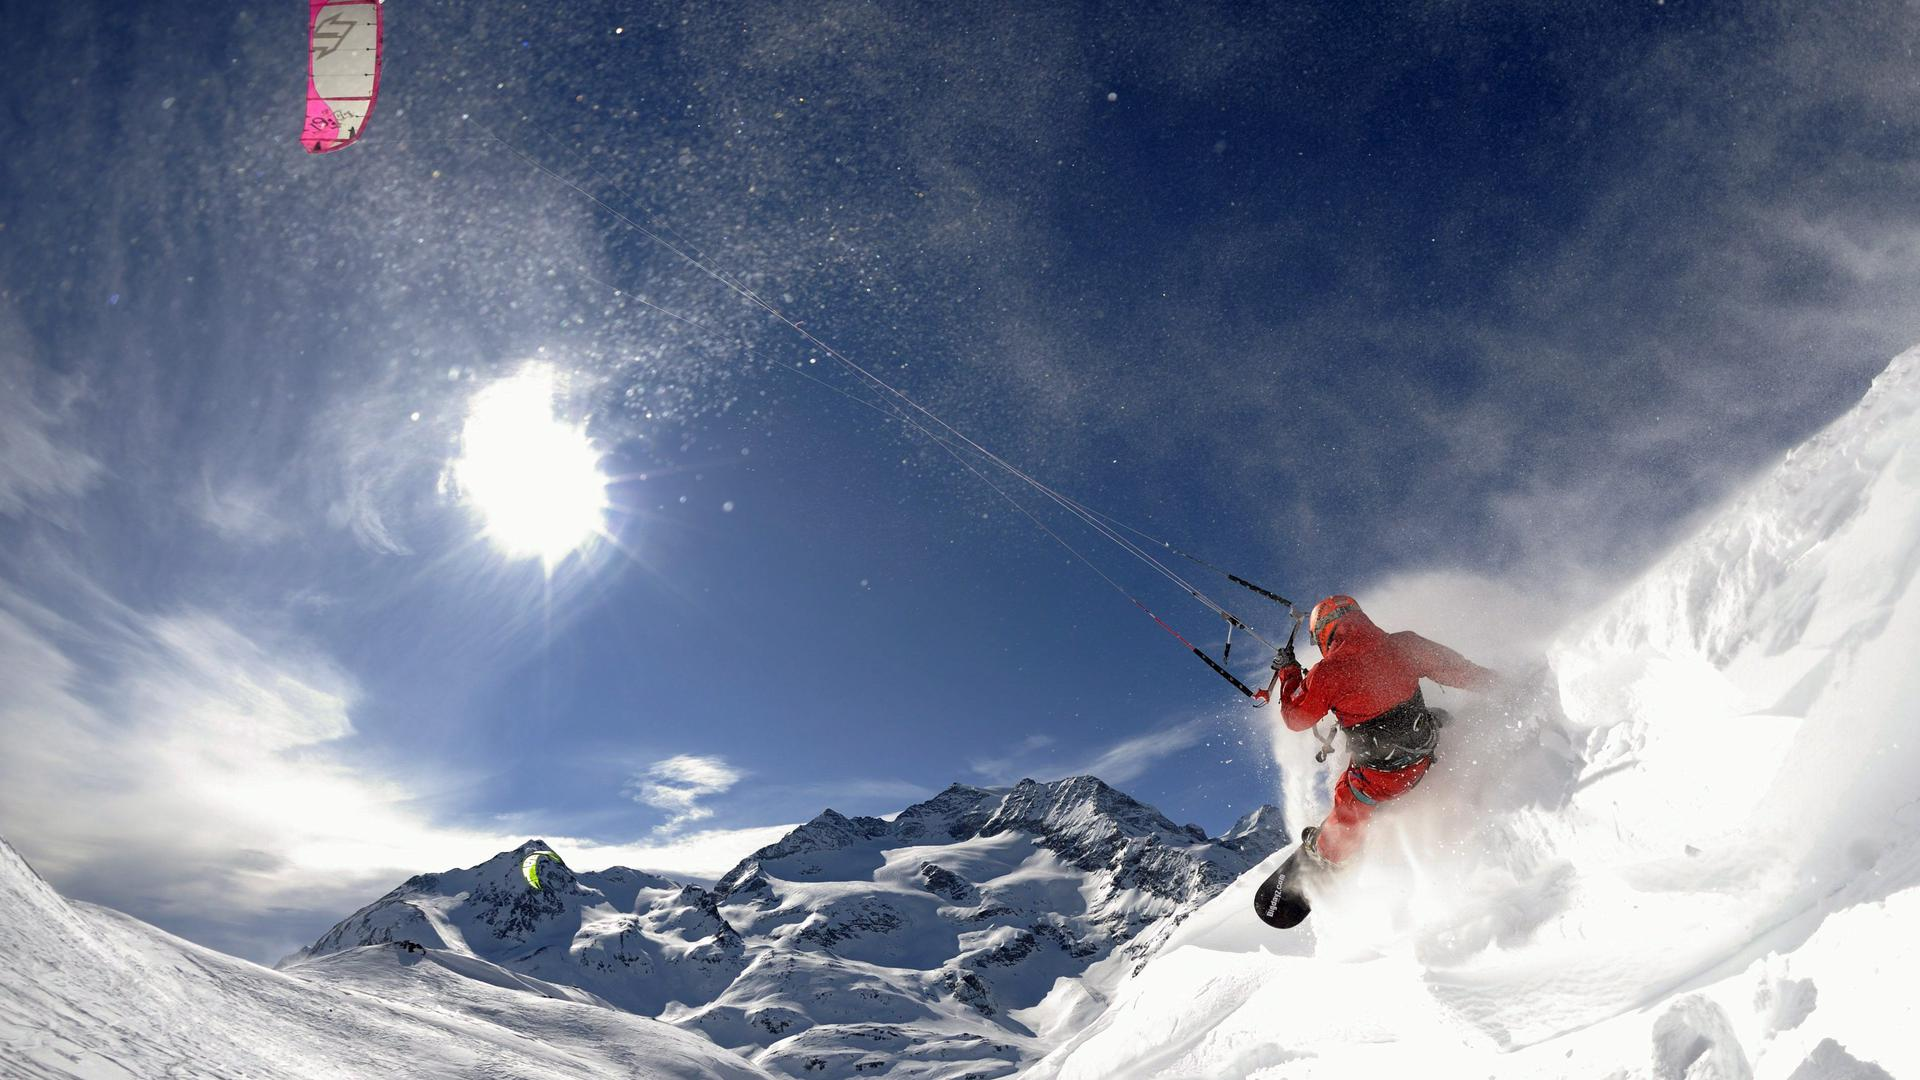 ARCHIV - Snow kite professional Marco Koeppel from Widnau, Switzerland, profits of the fresh winds to surfs the snowy mountains of the region of the Bernina Pass, Canton of Grisons, Switzerland on 19 February 2009. EPA/DIETMAR STIPLOVSEK NO SALES - NO ARCHIVES (zu dpa-Meldung: «Es geht extremer: Spektakuläre Wintersportarten abseits der X-Games» vom 21.01.2015) +++ dpa-Bildfunk +++